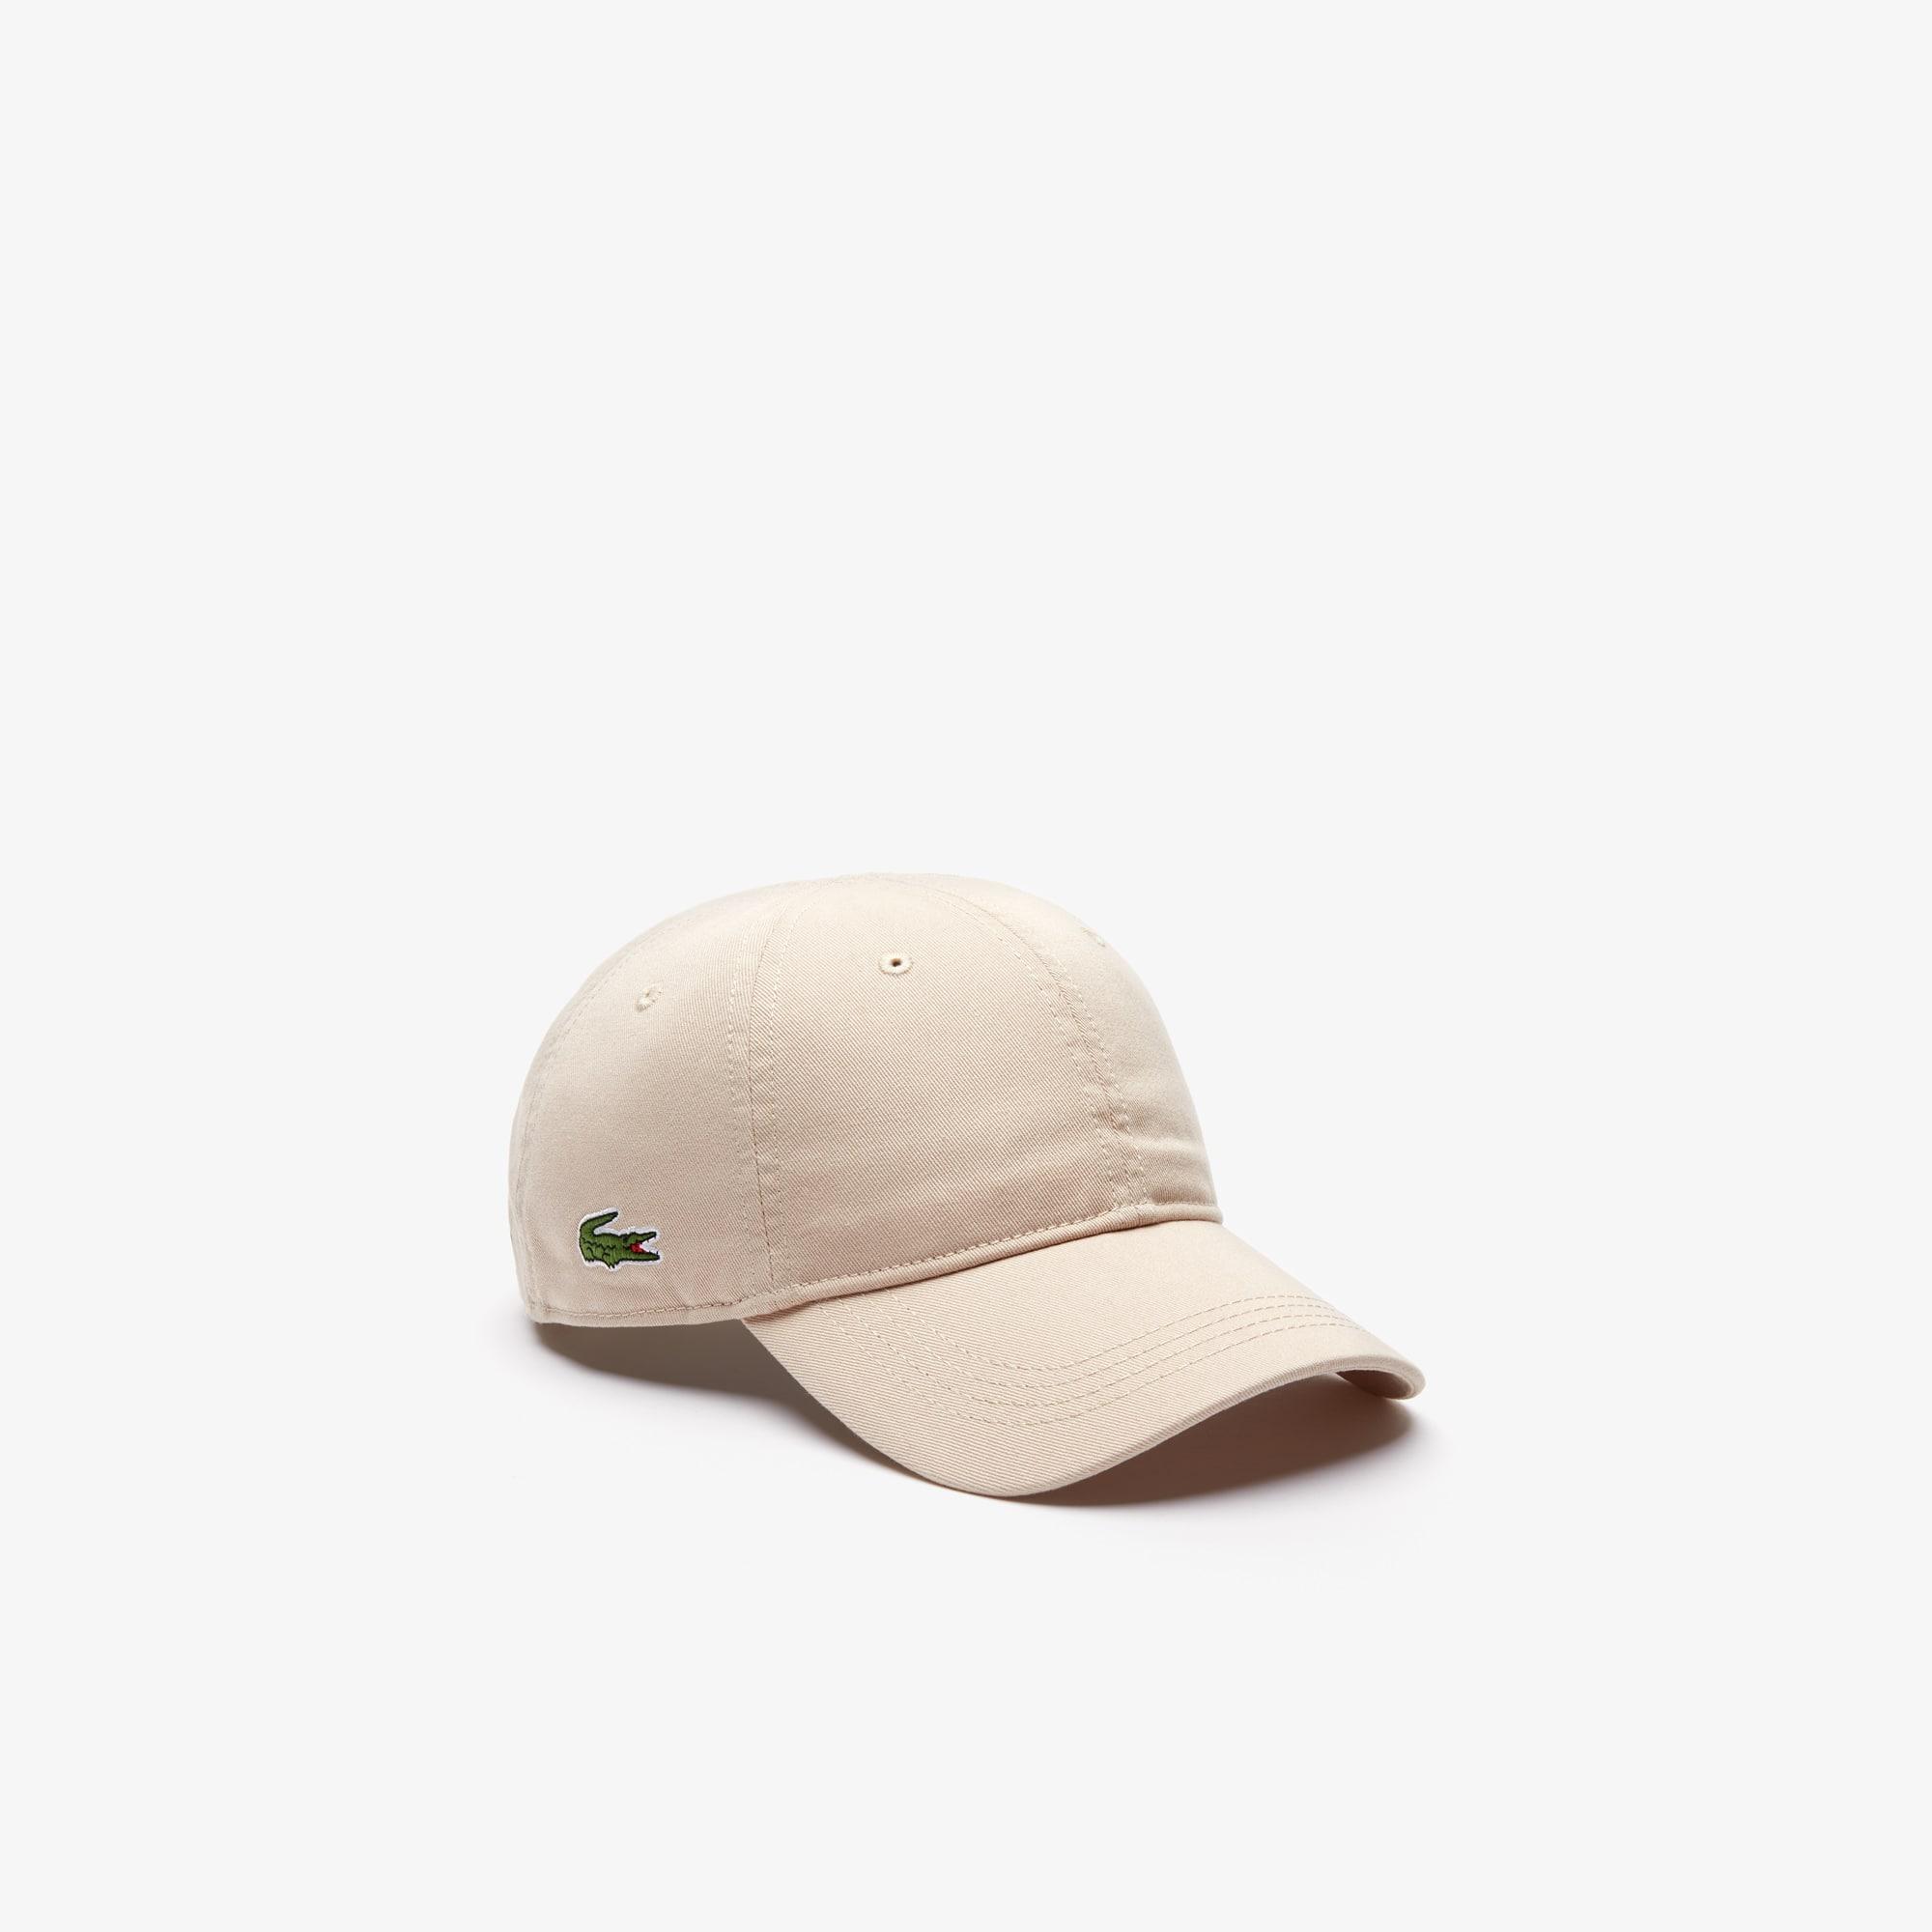 af235429e94 Men s Gabardine cap. £30.00. + 9 colors